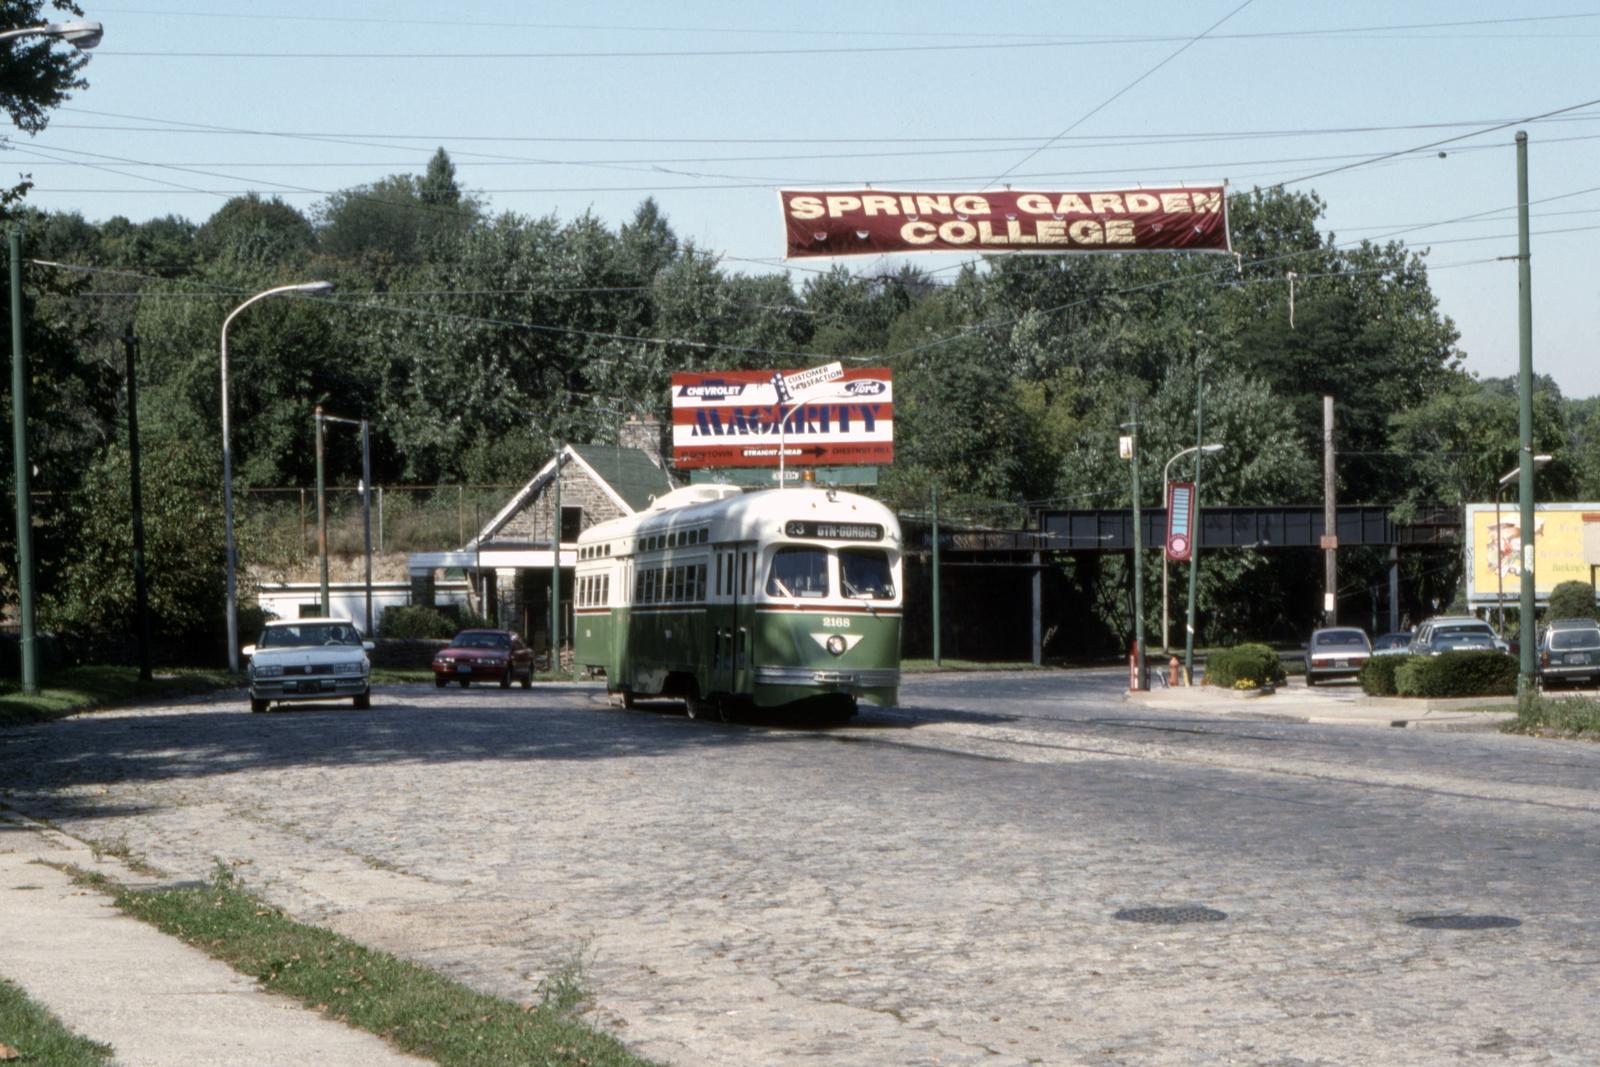 (800k, 1600x1067)<br><b>Country:</b> United States<br><b>City:</b> Philadelphia, PA<br><b>System:</b> SEPTA (or Predecessor)<br><b>Line:</b> Rt. 23-Germantown<br><b>Location:</b> Germantown/Highland<br><b>Car:</b> PTC/SEPTA Postwar All-electric PCC (St.Louis, 1948) 2168 <br><b>Collection of:</b> David Pirmann<br><b>Date:</b> 10/1992<br><b>Viewed (this week/total):</b> 1 / 88